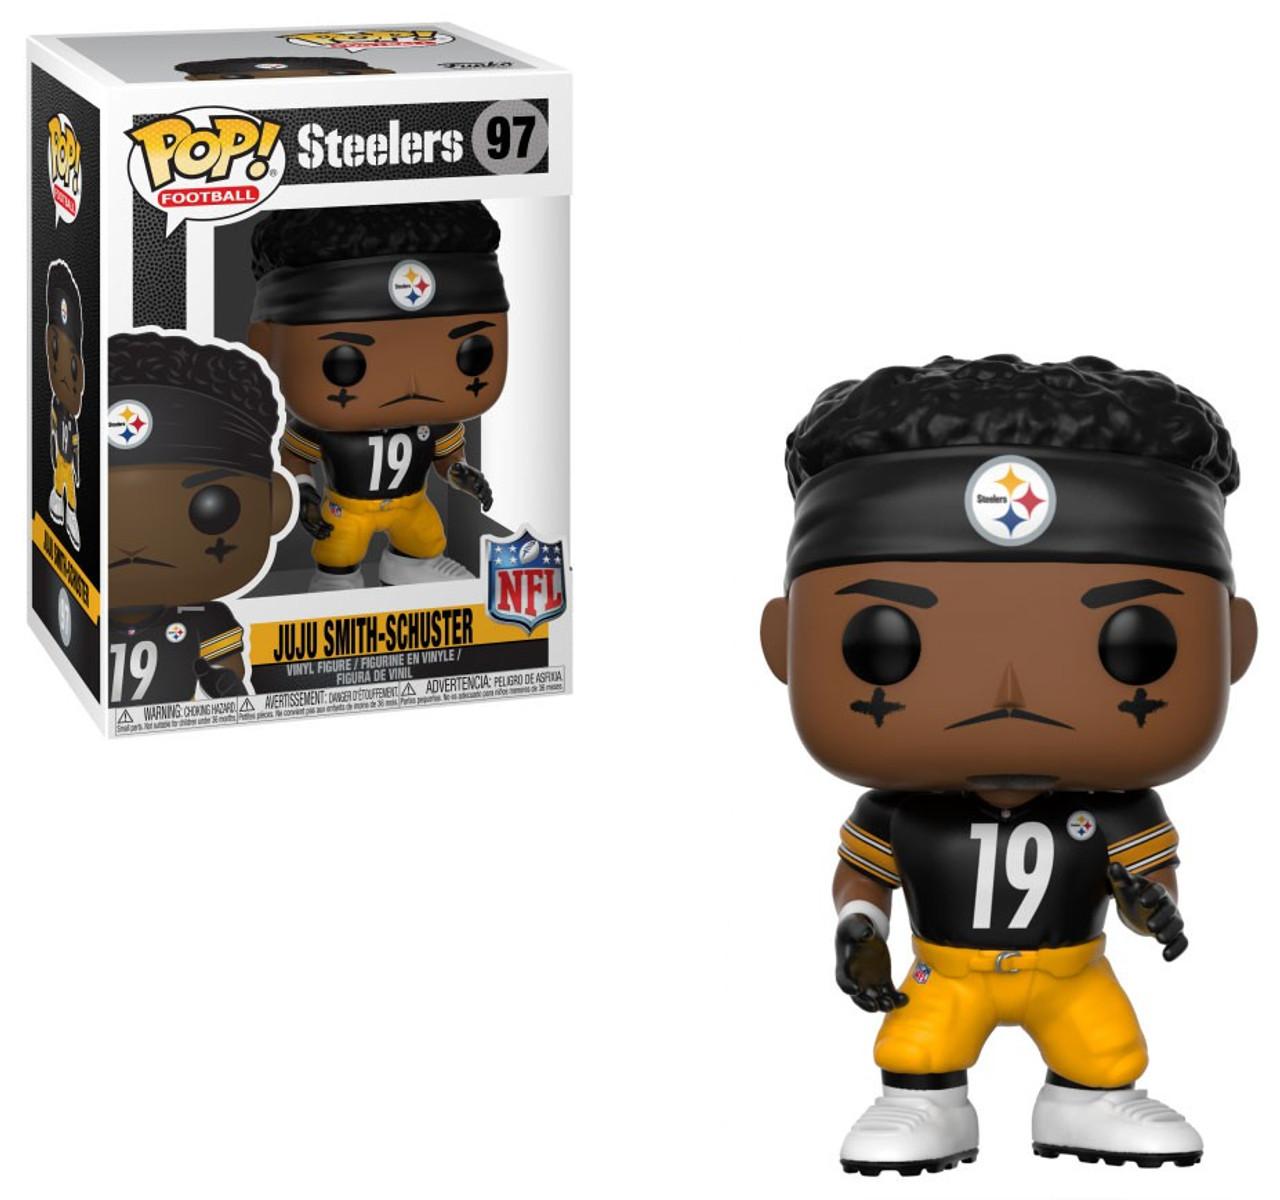 c3c1127b773 Funko NFL Pittsburgh Steelers Funko POP Sports Ju Ju Smith Schuster Vinyl  Figure 97 Black Jersey - ToyWiz